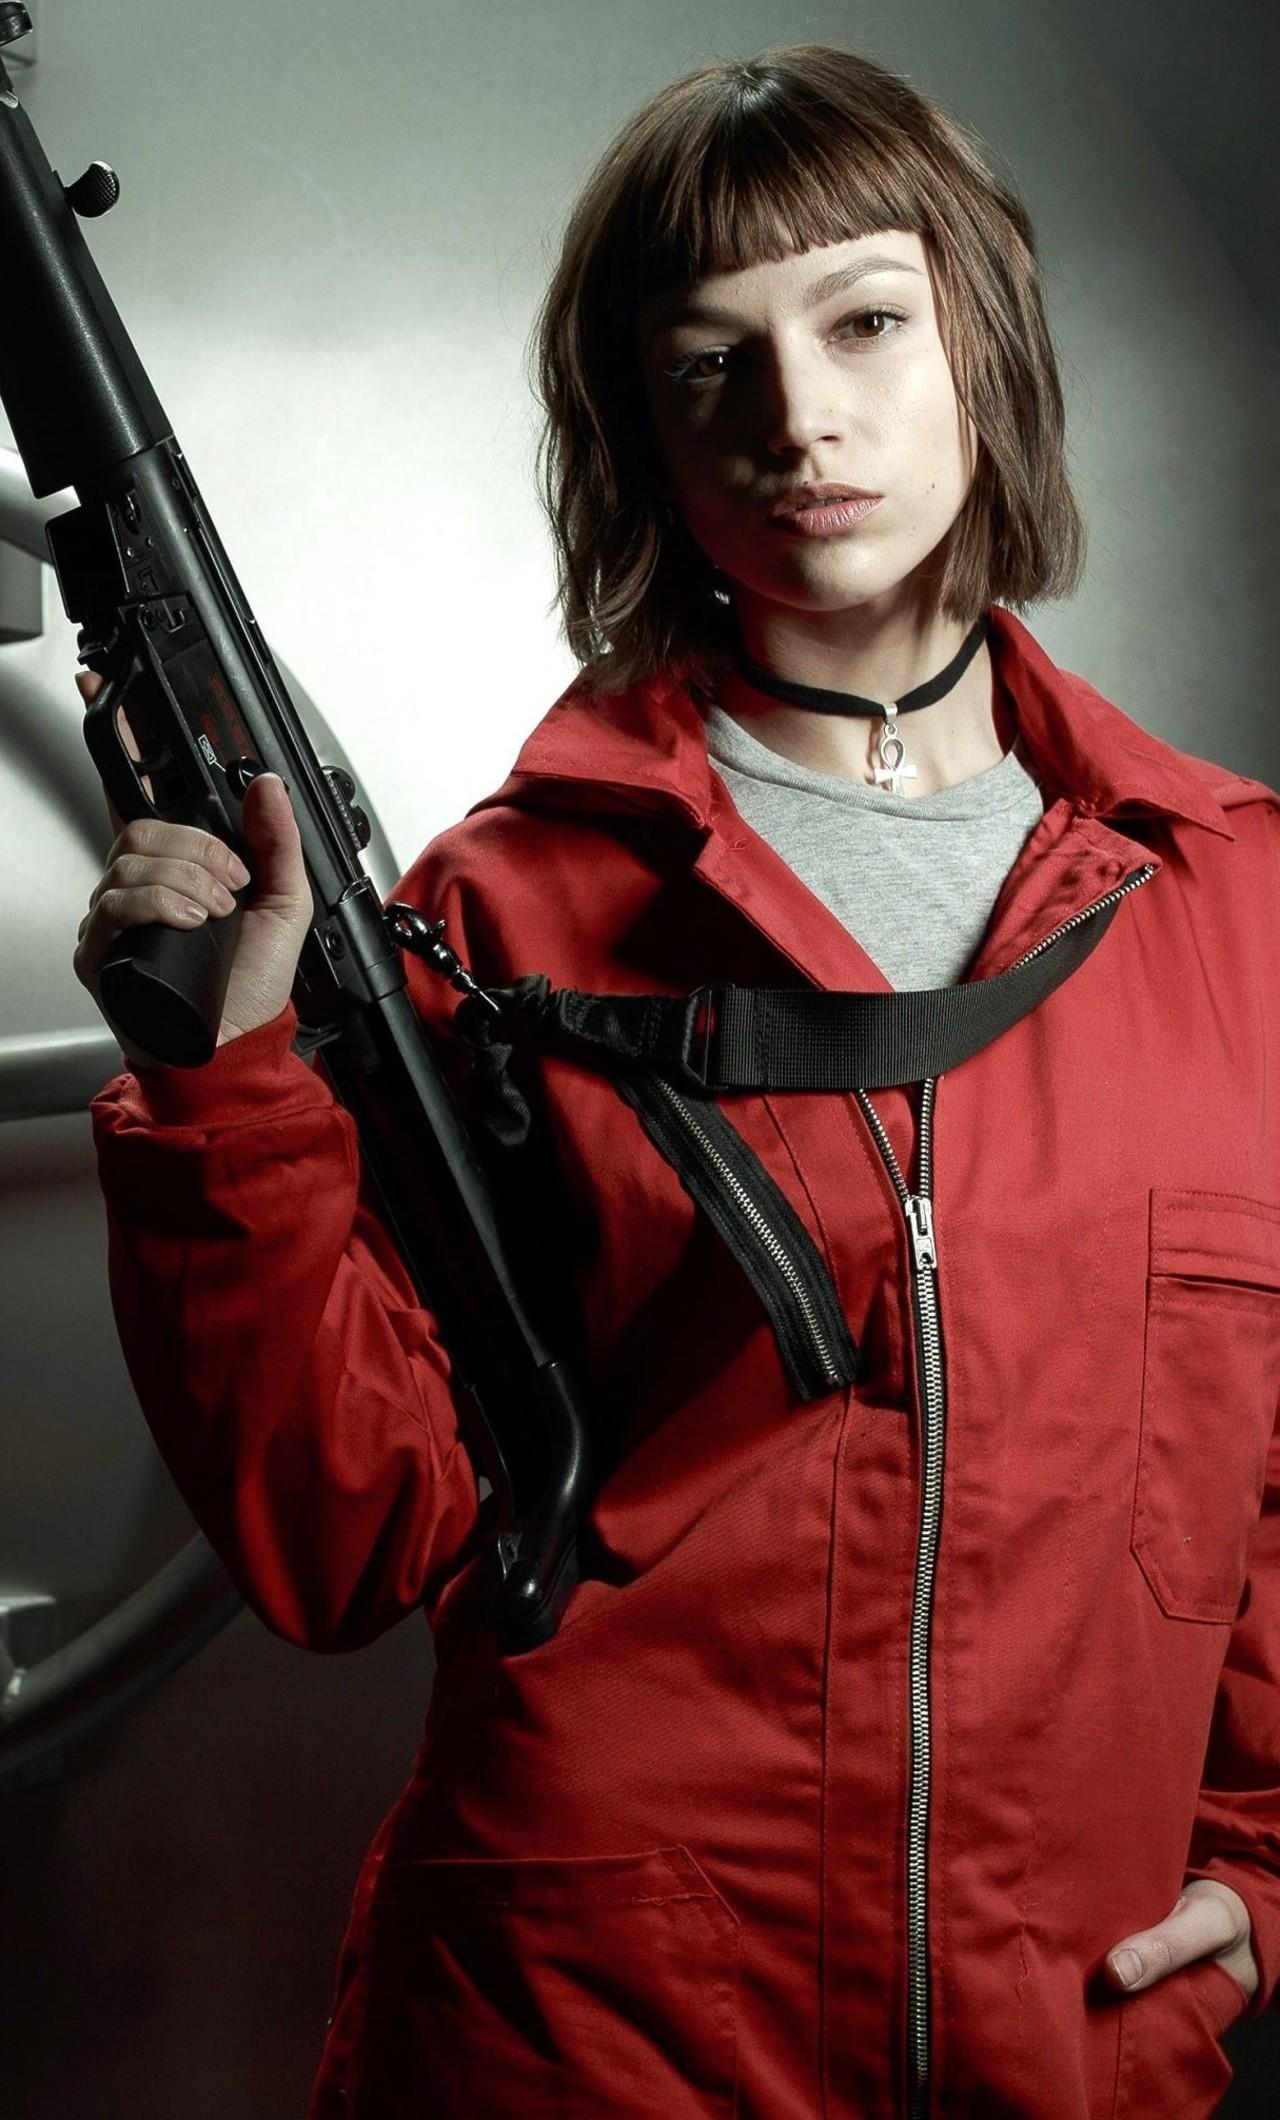 Ursula Corbero alias Tokio. Fun fact: Hun gjester musikkvideoen til Un Dia med J Balvin, Dua Lipa og Bad Bunny (Netflix)